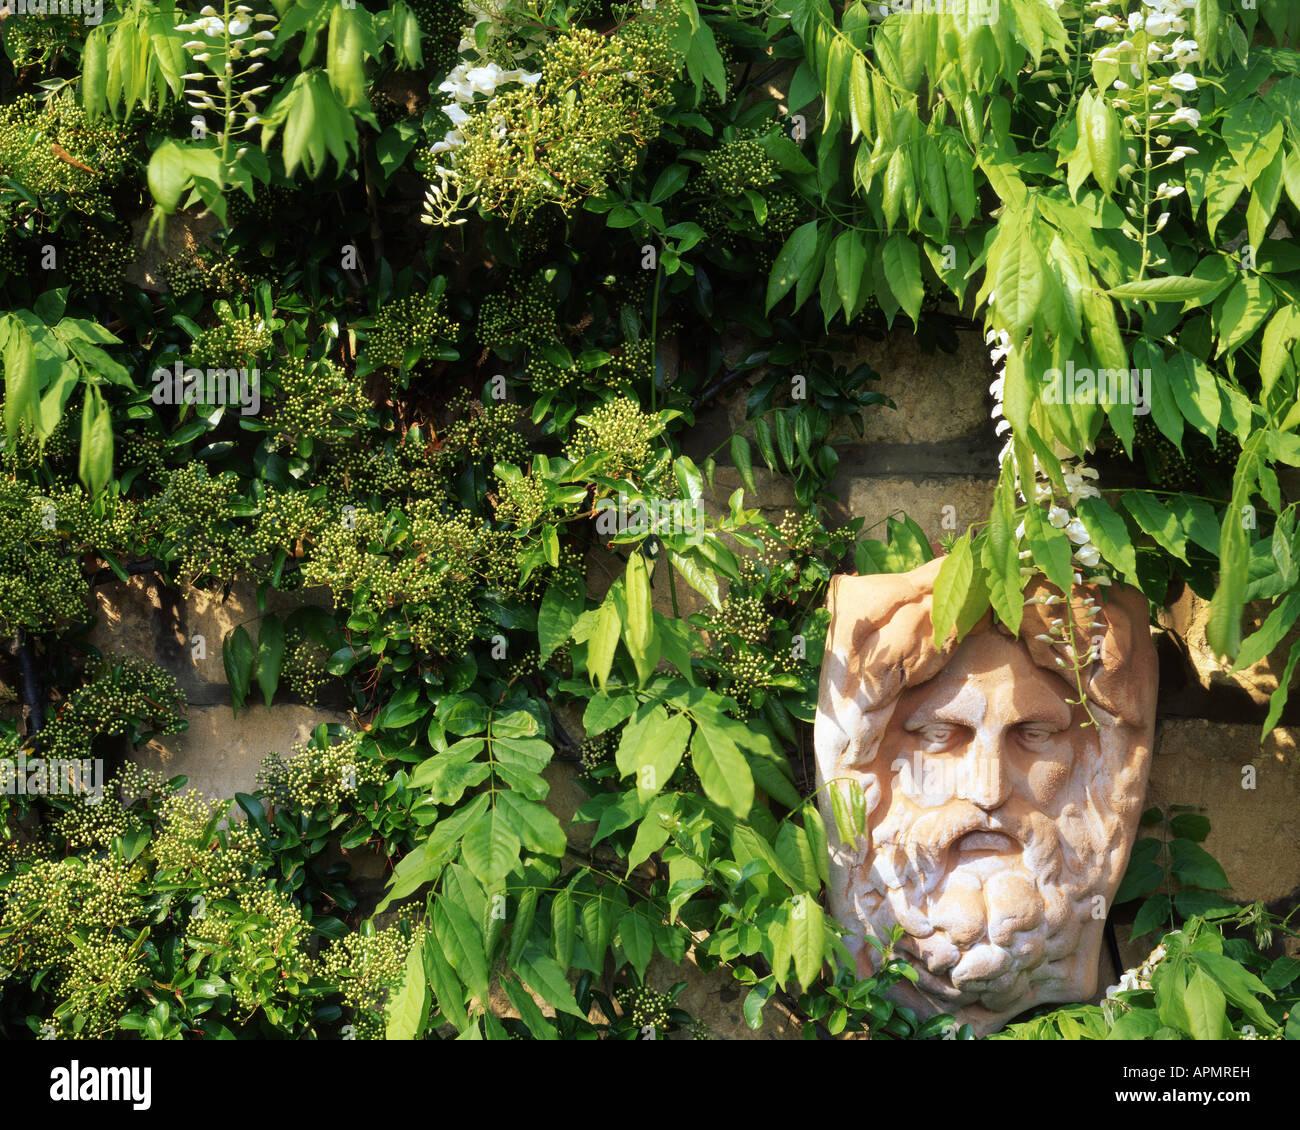 GB - GLOUCESTERSHIRE: Garden Detail at Parkgate (Cheltenham) - Stock Image